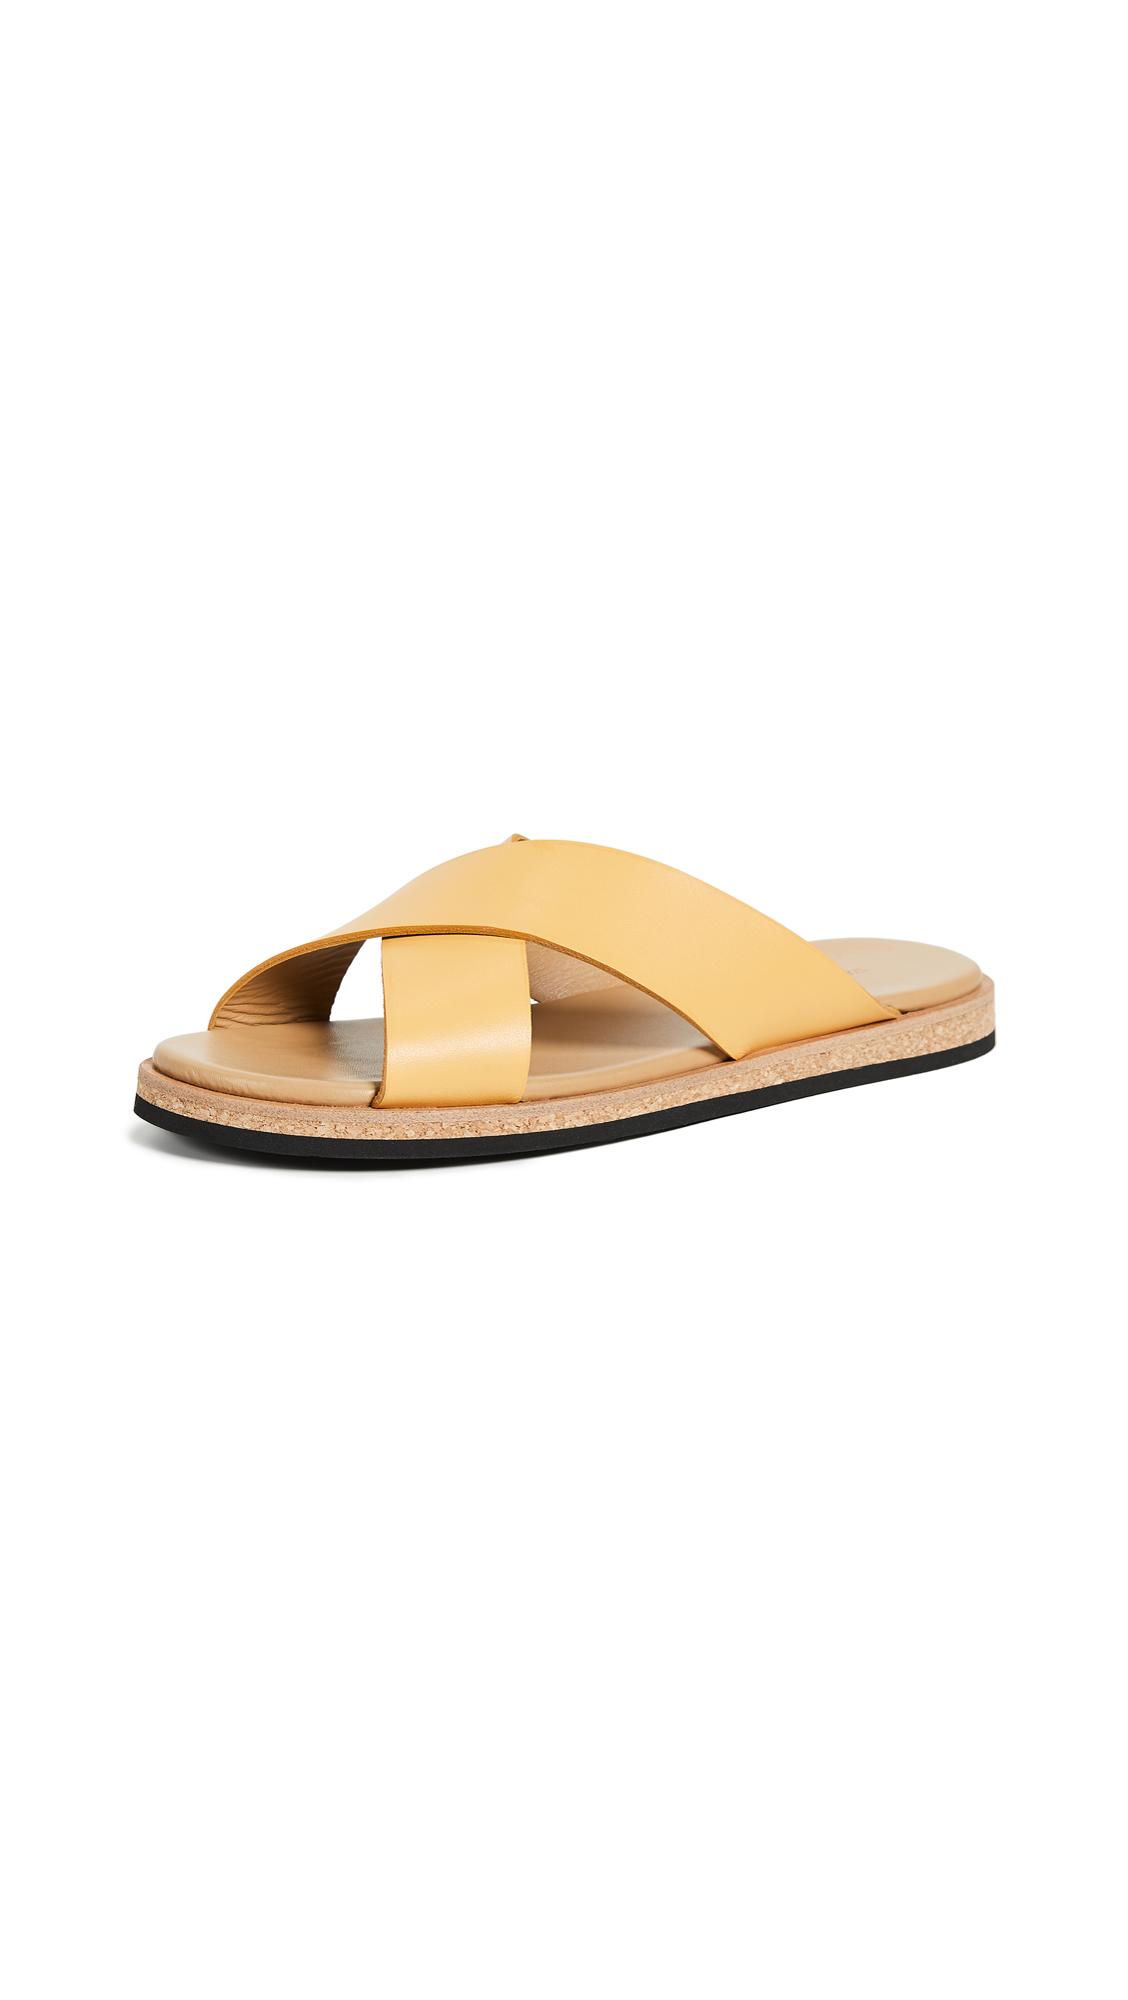 WANT Les Essentiels Kavala Crossover Flat Sandals - Desert Marigold